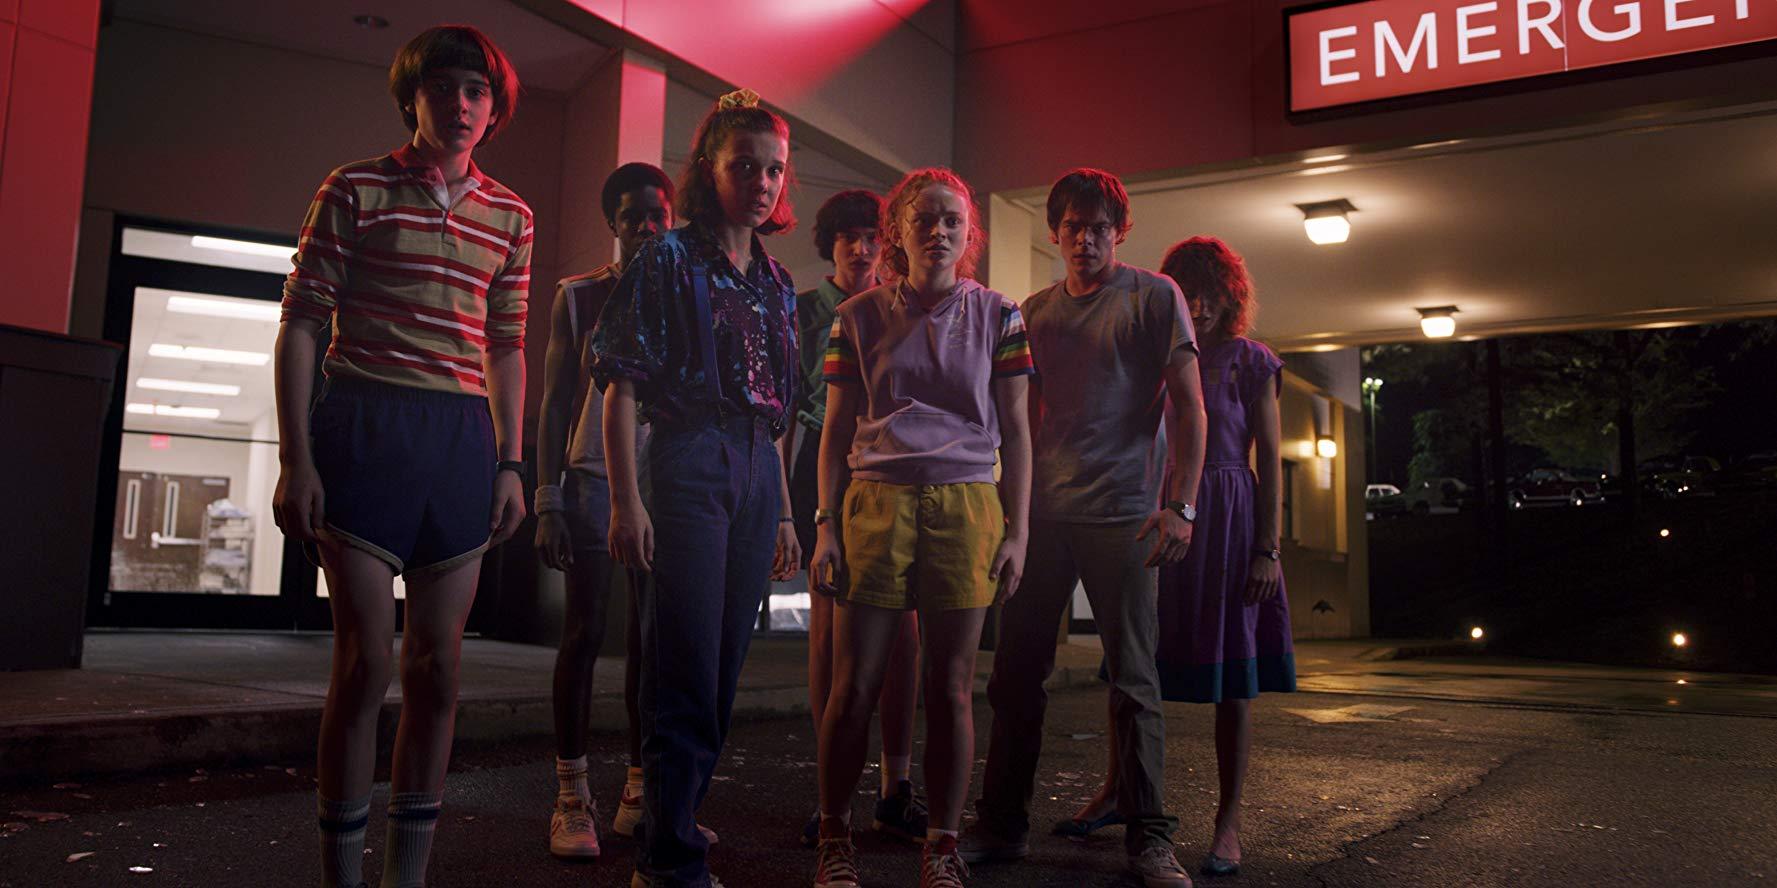 🐙 Dyvytysja na vyhidnyh: serial Stranger Things / «Dyvni Dyva» — vyjšov 3 sezon